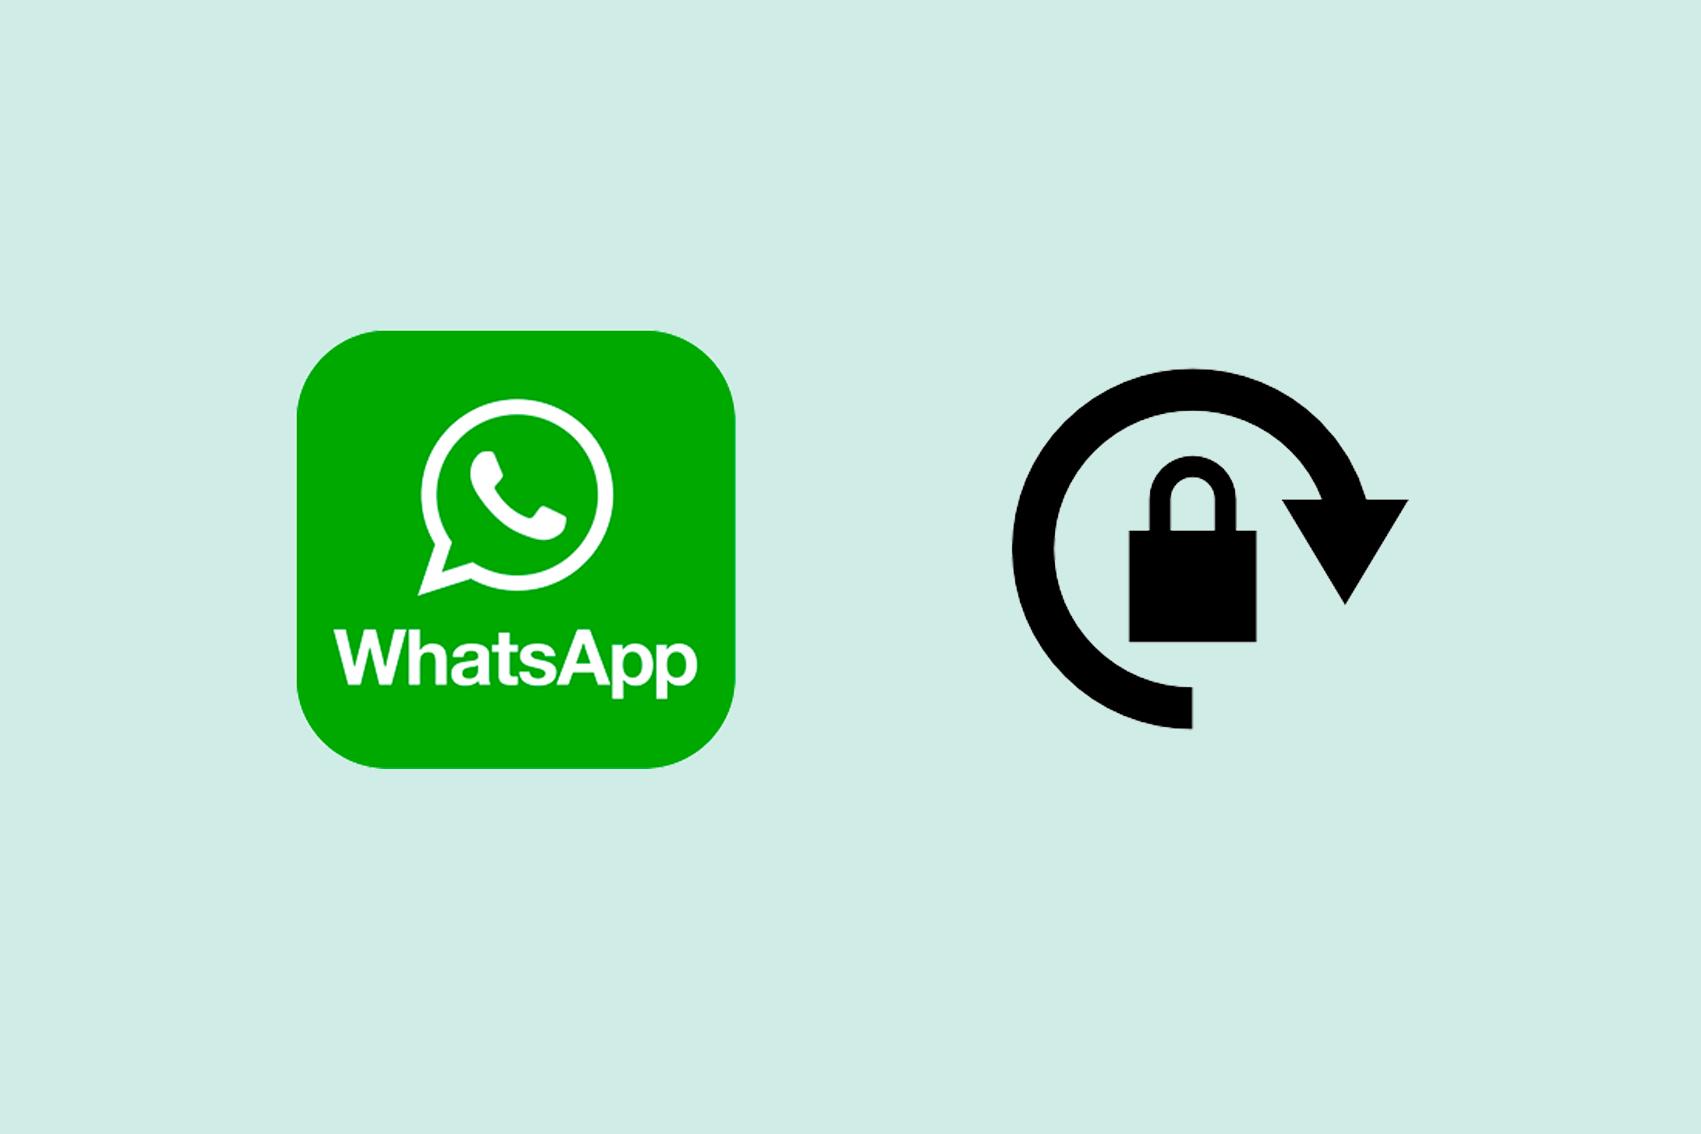 Как поставить пароль на WhatsApp на Android